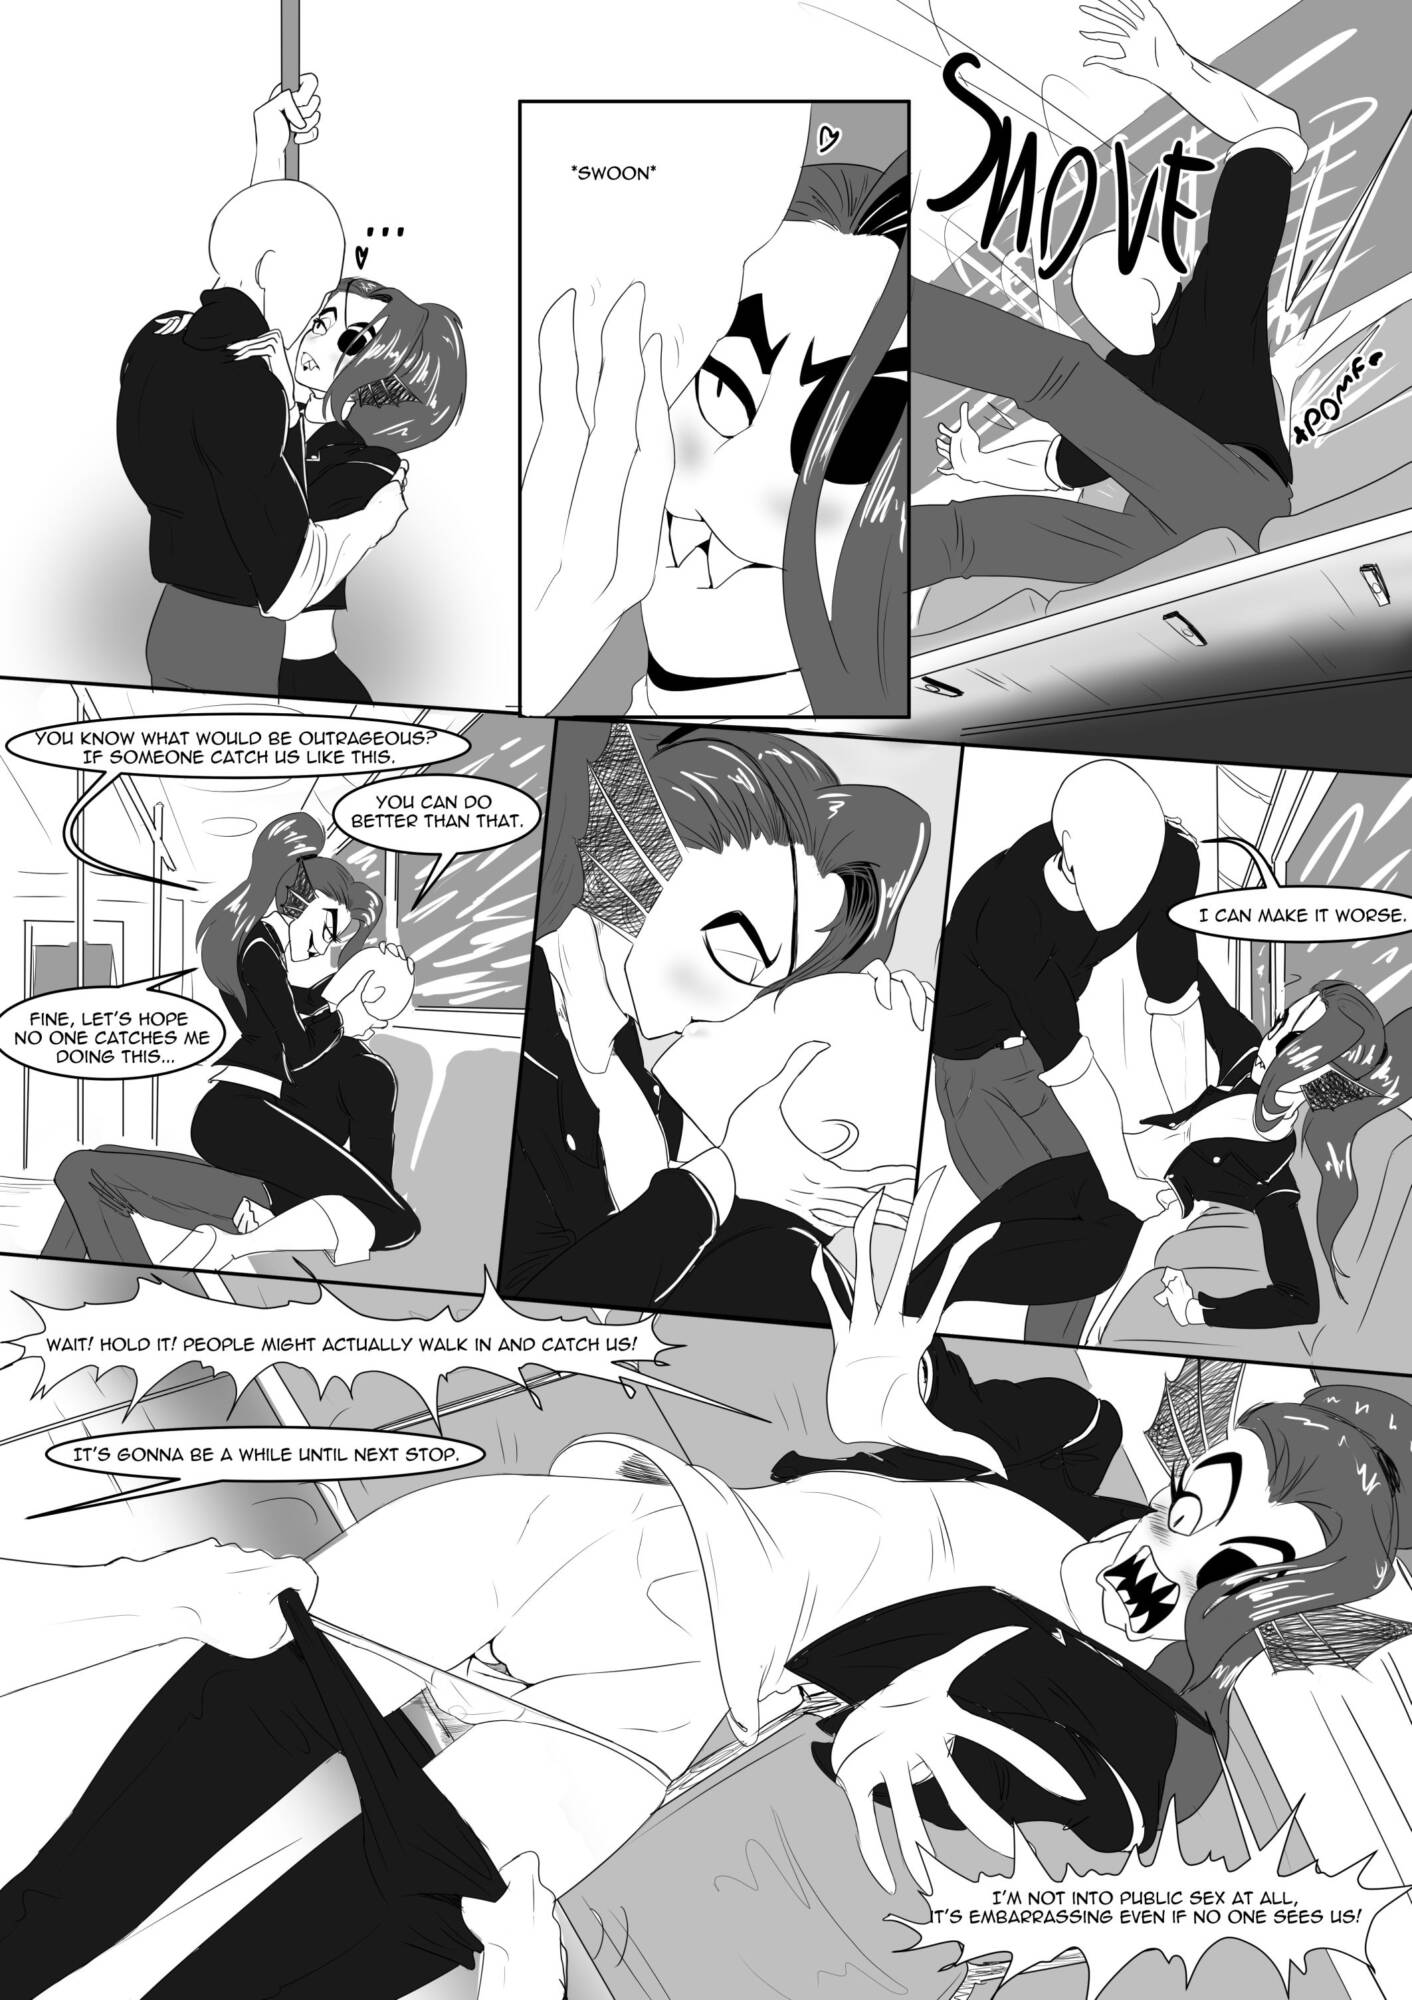 Battle Against a True Nympho - Story 2 (English) - page09 Undertale,  xxx porn rule34